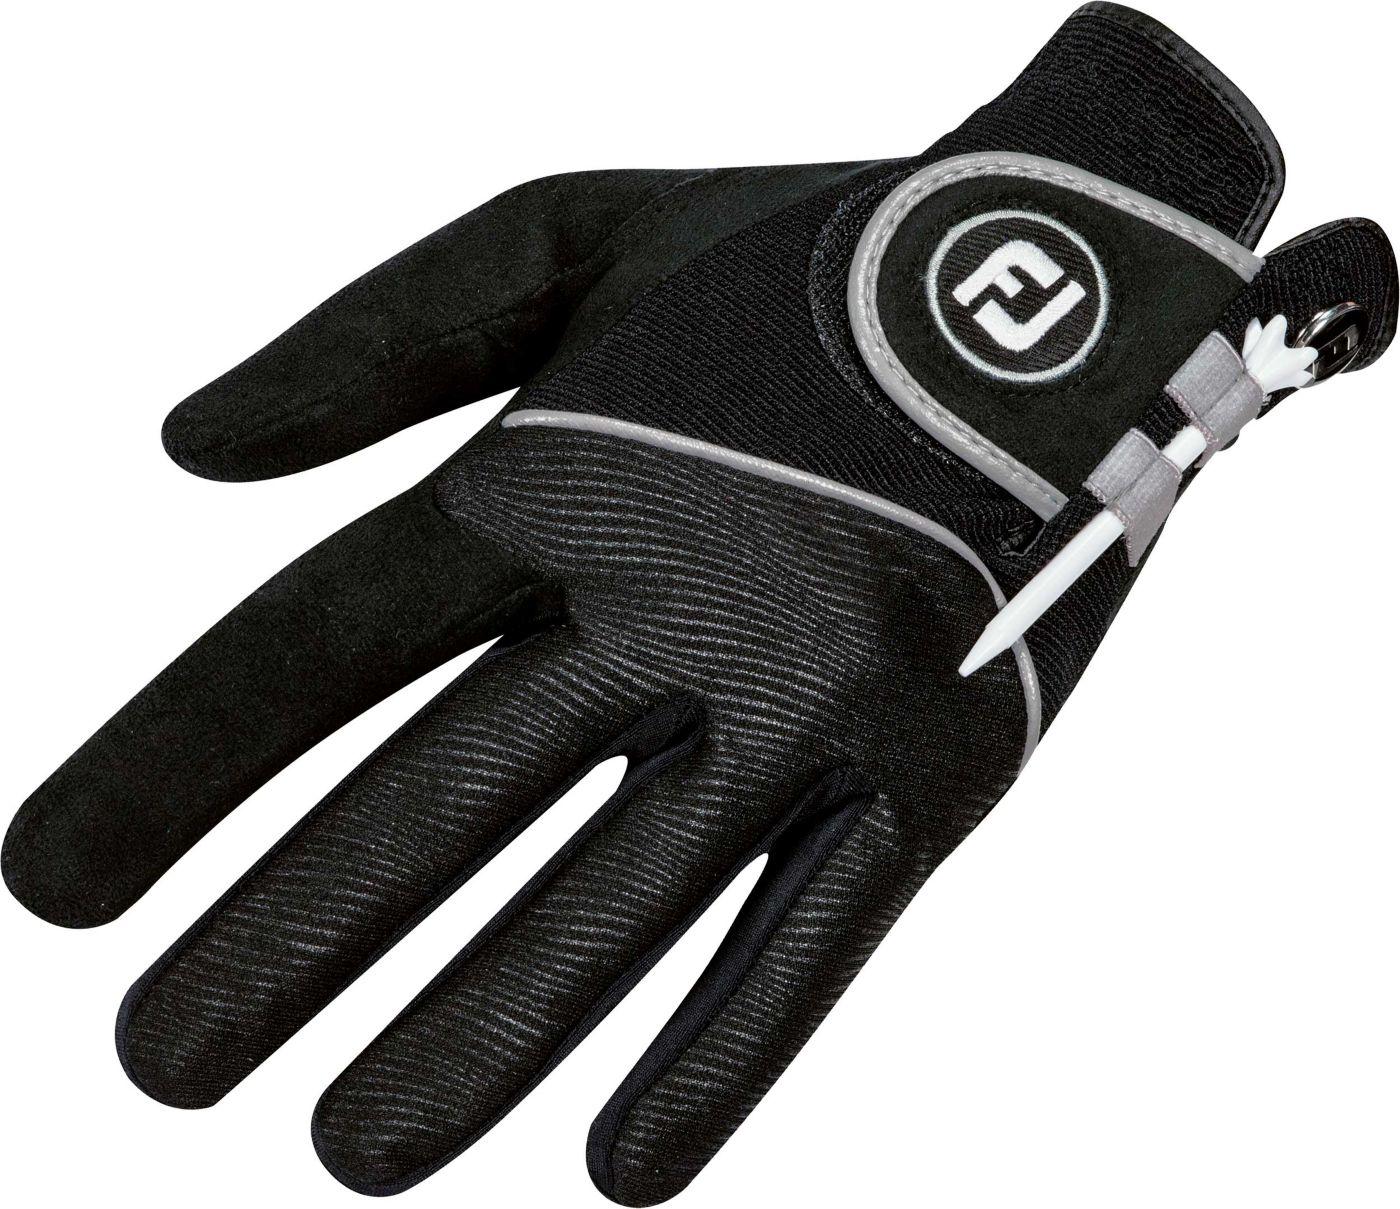 FootJoy Women's RainGrip Golf Gloves - Pair